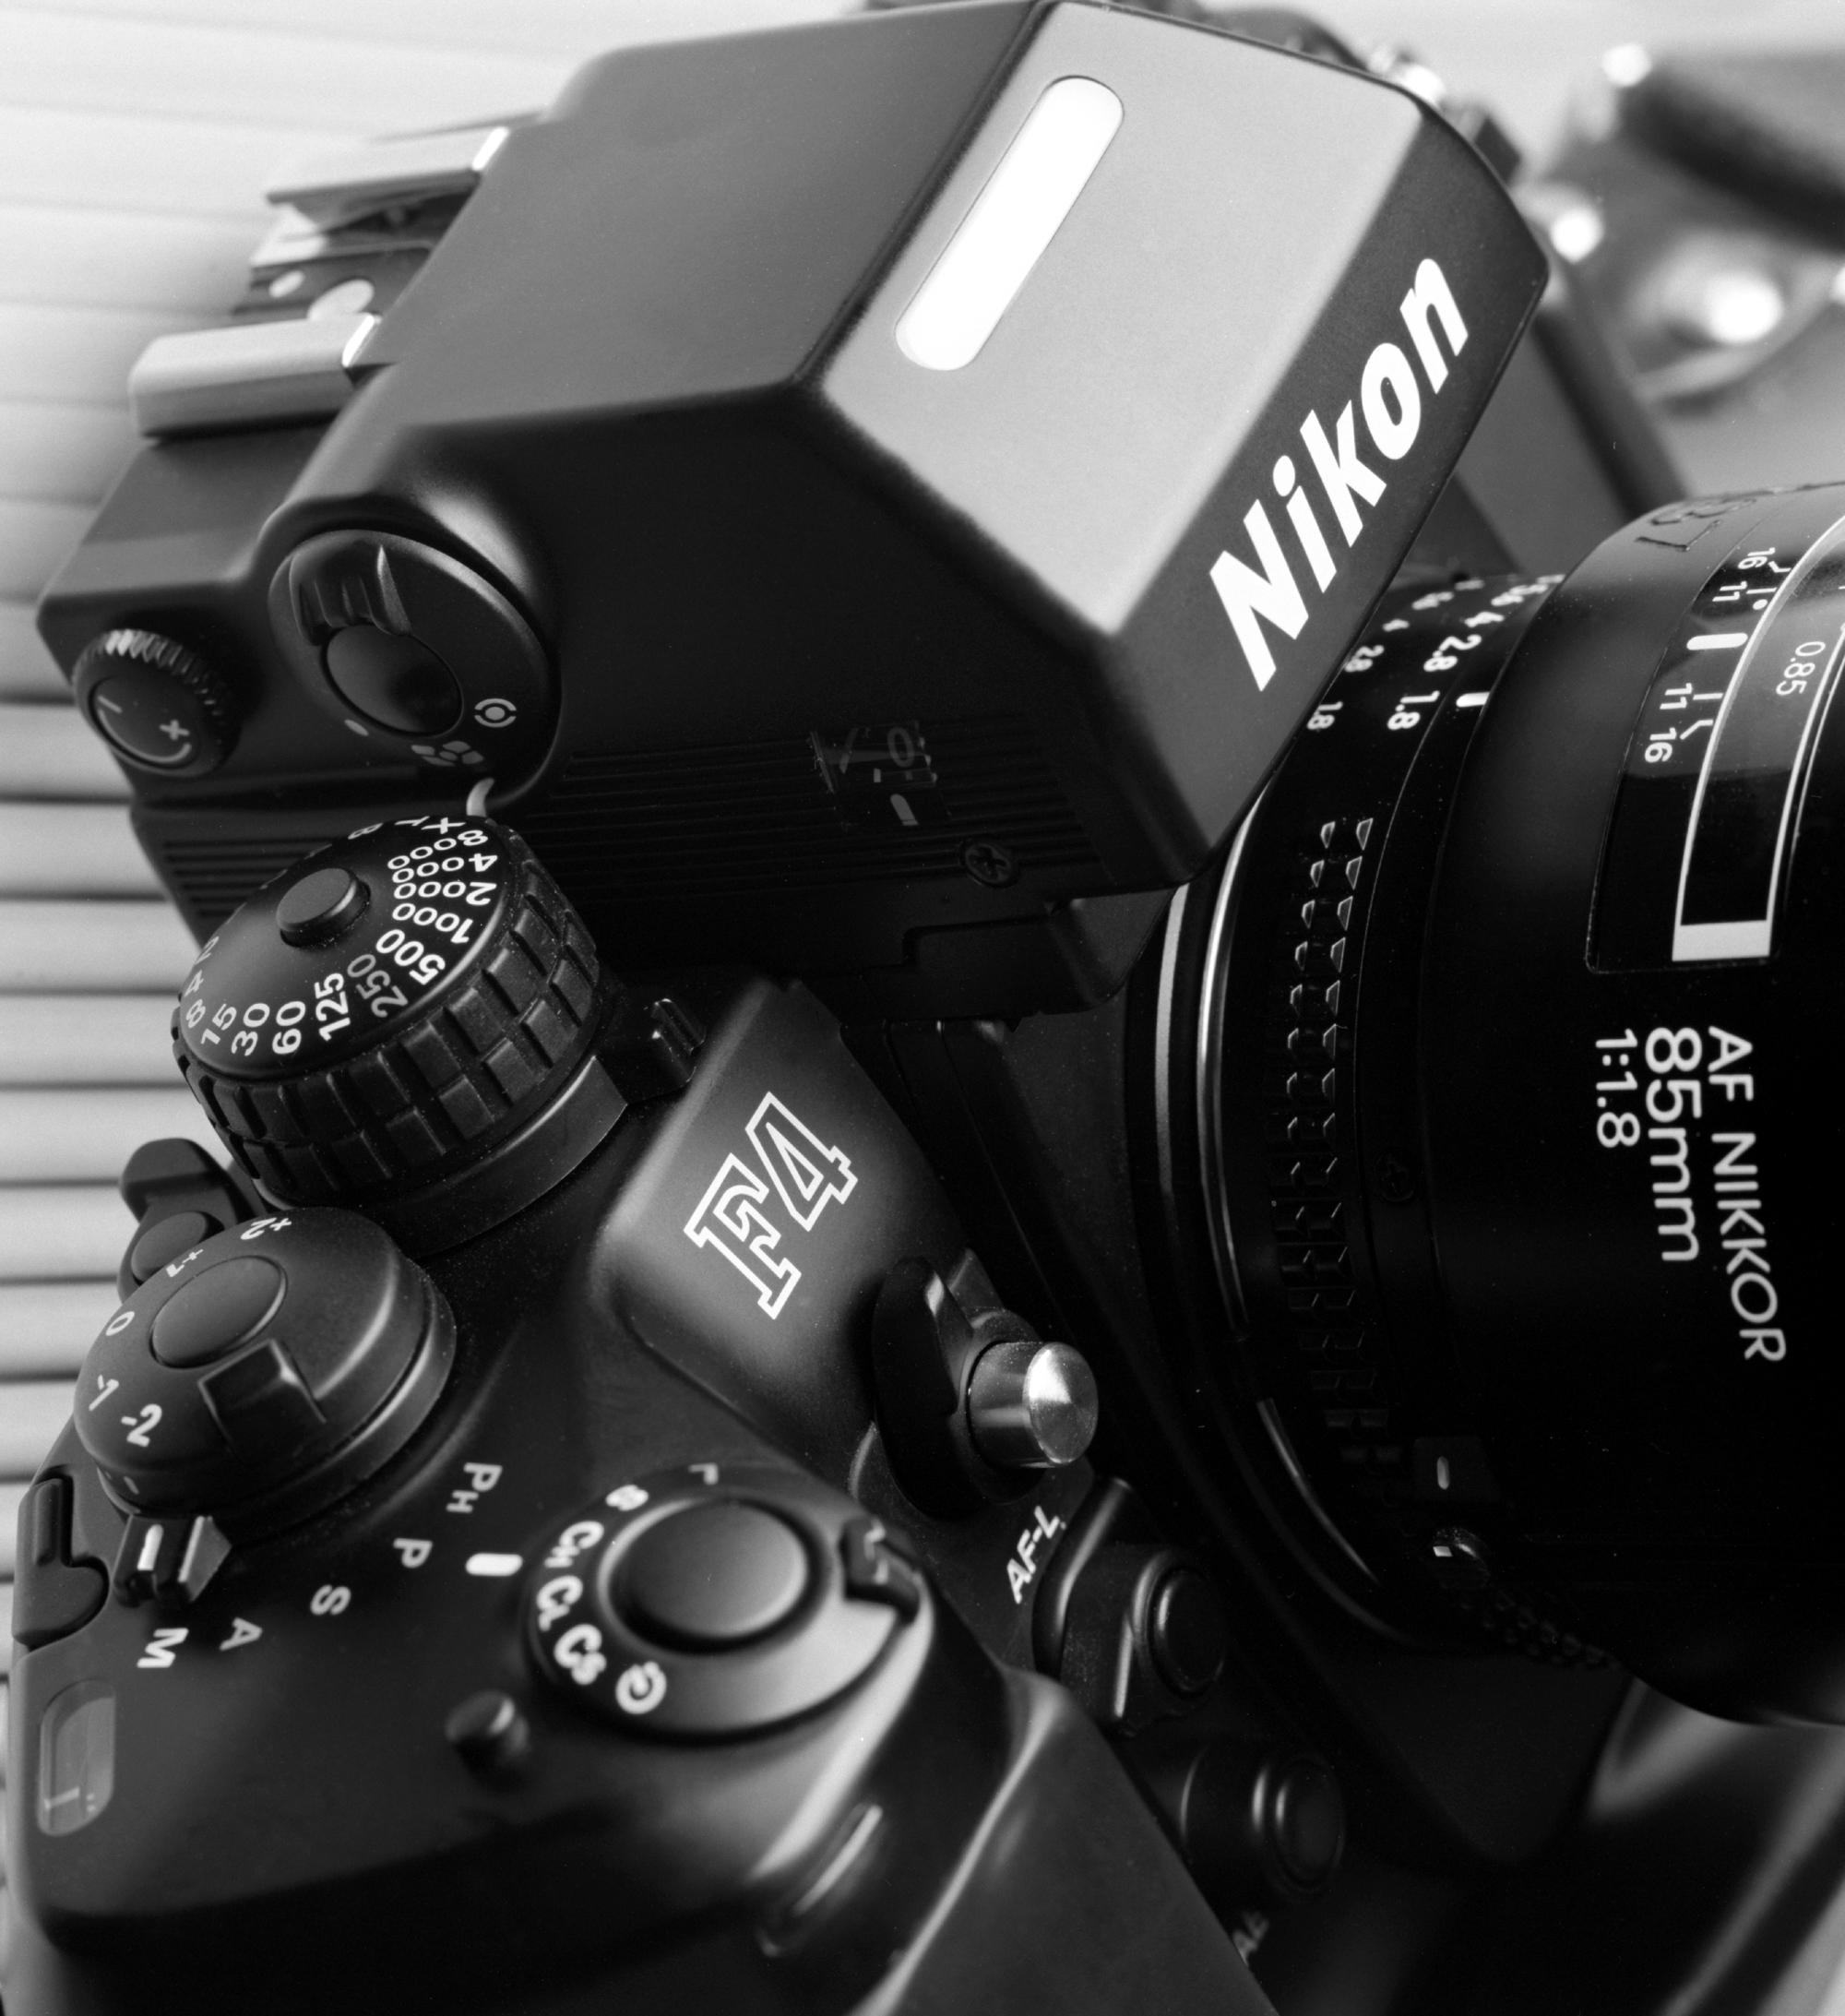 Nikon F4 by BBisset in Regular Member Gallery